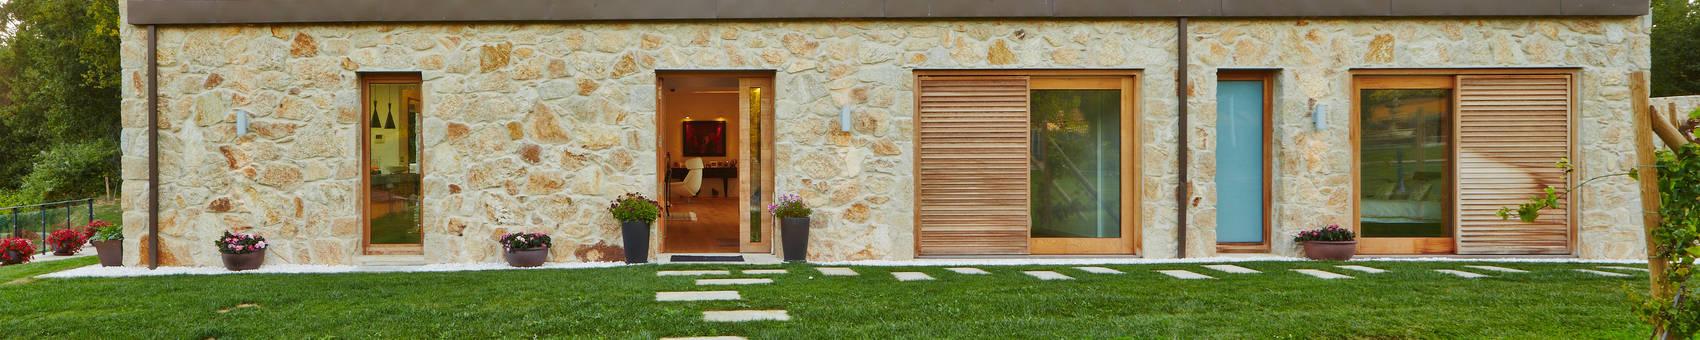 Vivienda Unifamiliar en Tomiño, Pontevedra (Spain) HUGA ARQUITECTOS Casas de estilo rústico